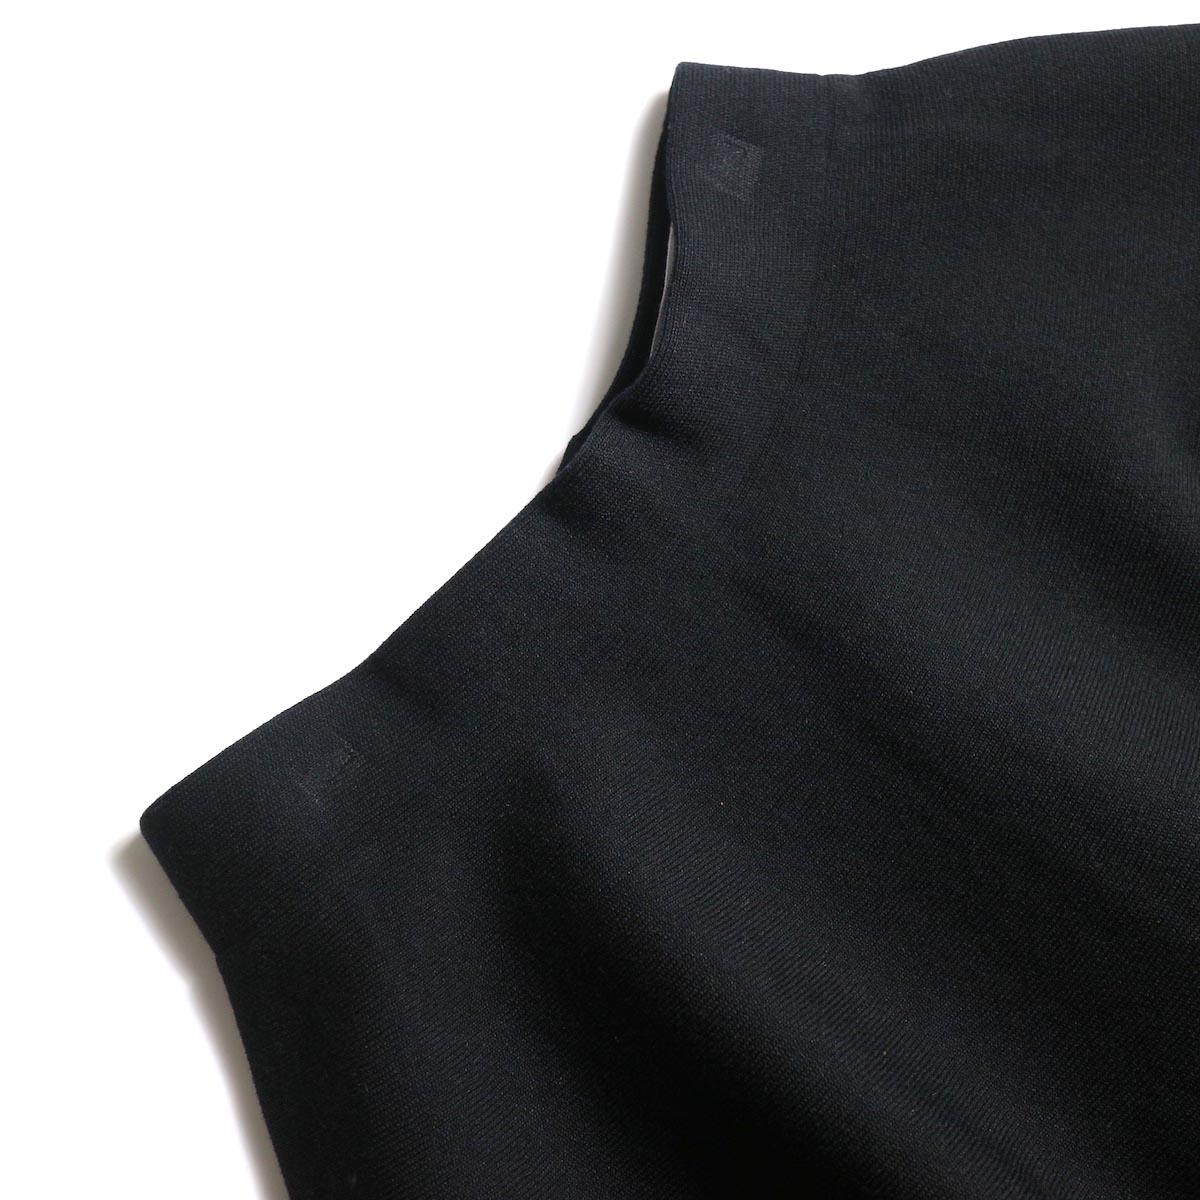 BLUEBIRD BOULEVARD / ミラノリブニットスカート (Black)ウエスト